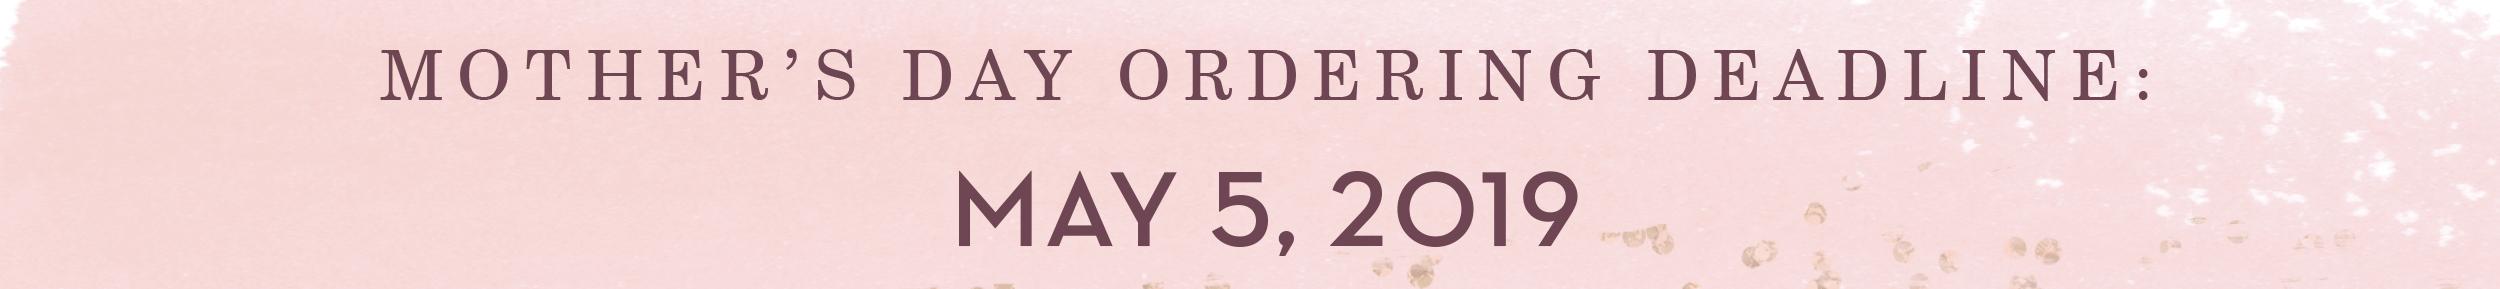 mothers-day-jewelry-ordering-deadline.jpg